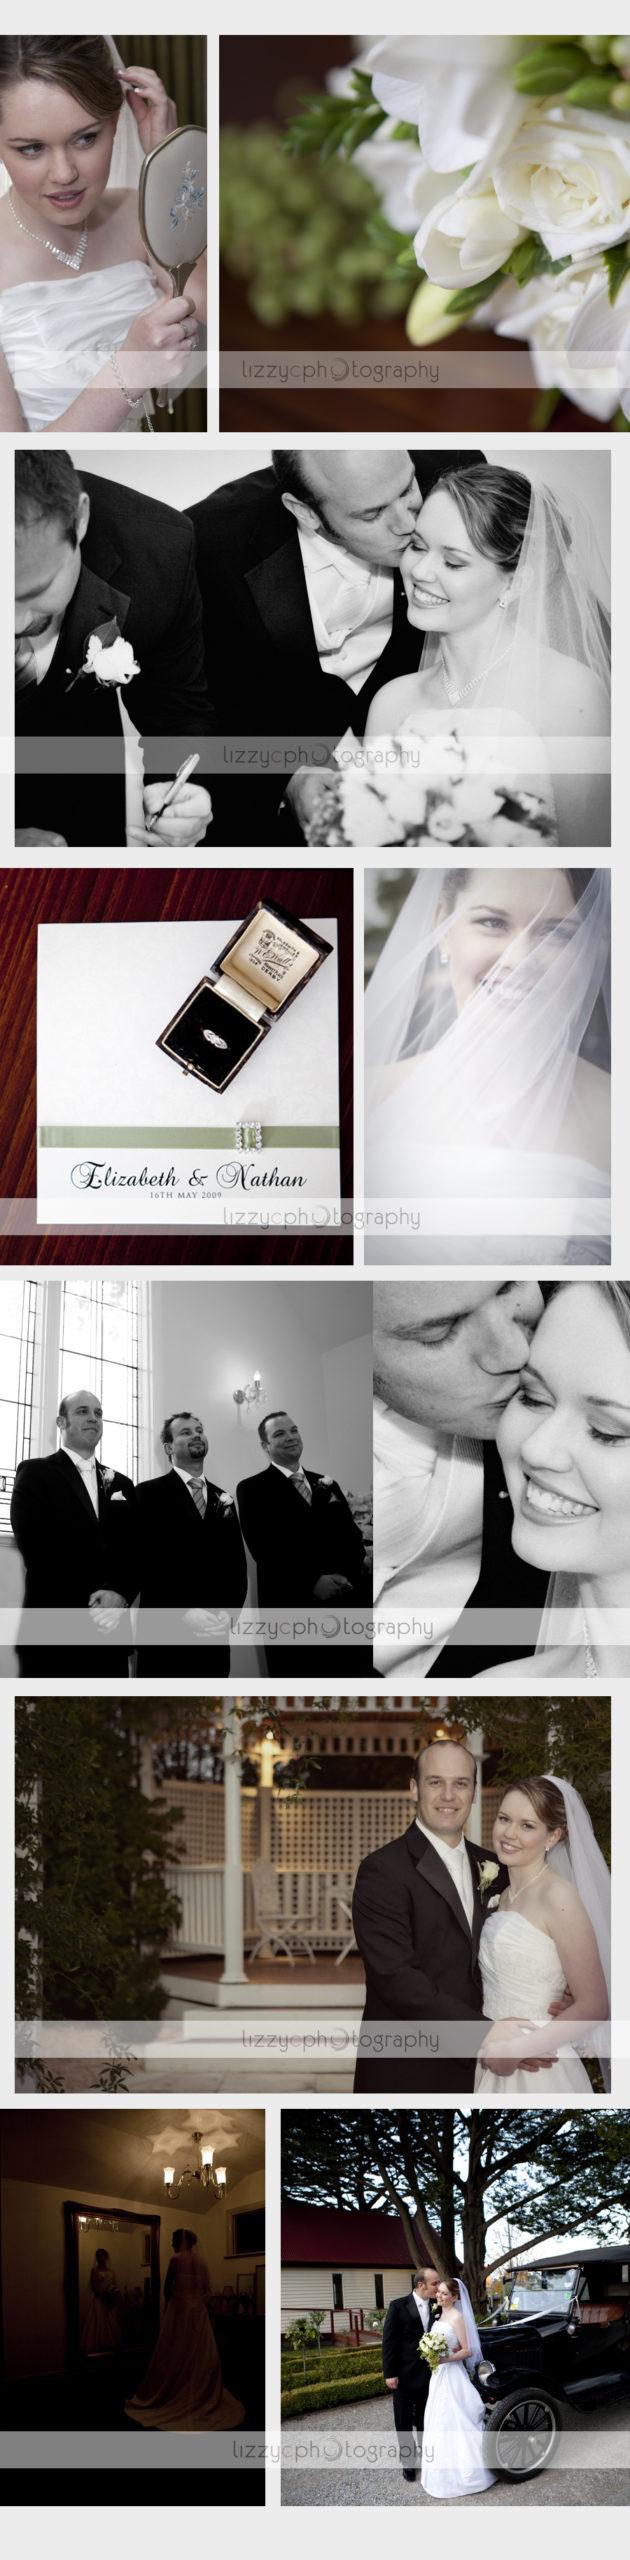 wedding photographer rosebank receptions